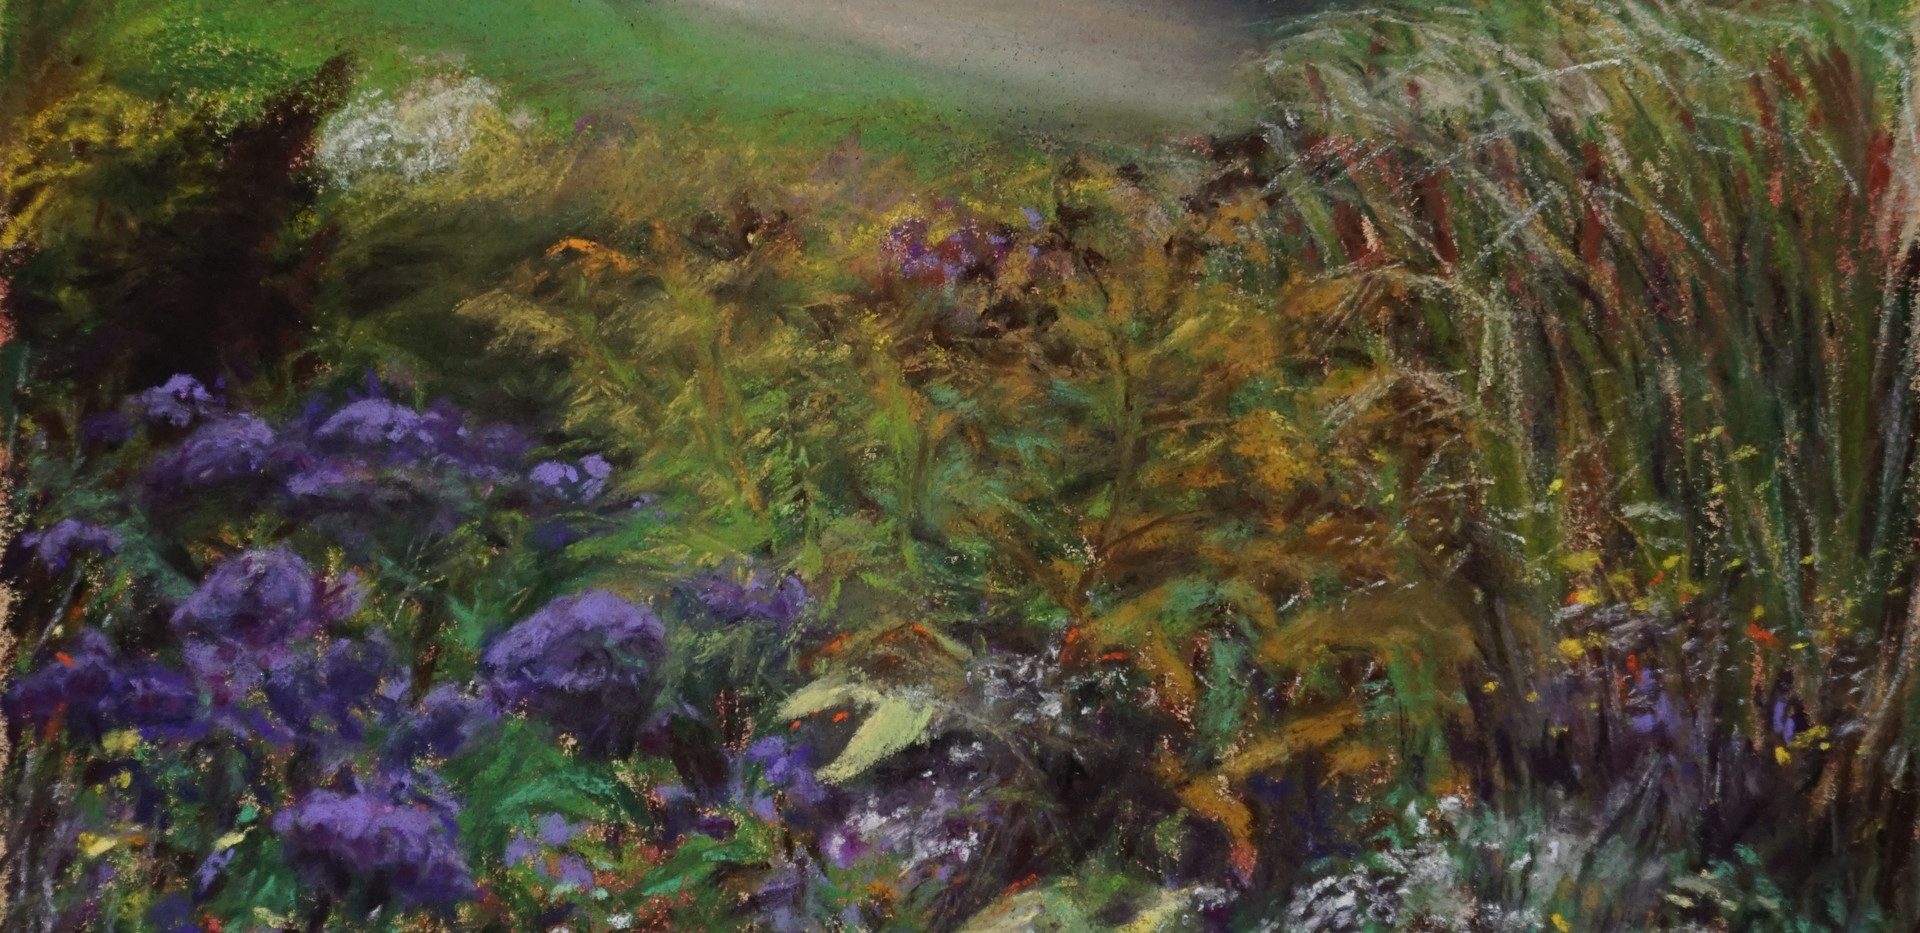 Bruce Trail Wildflowers.jpg